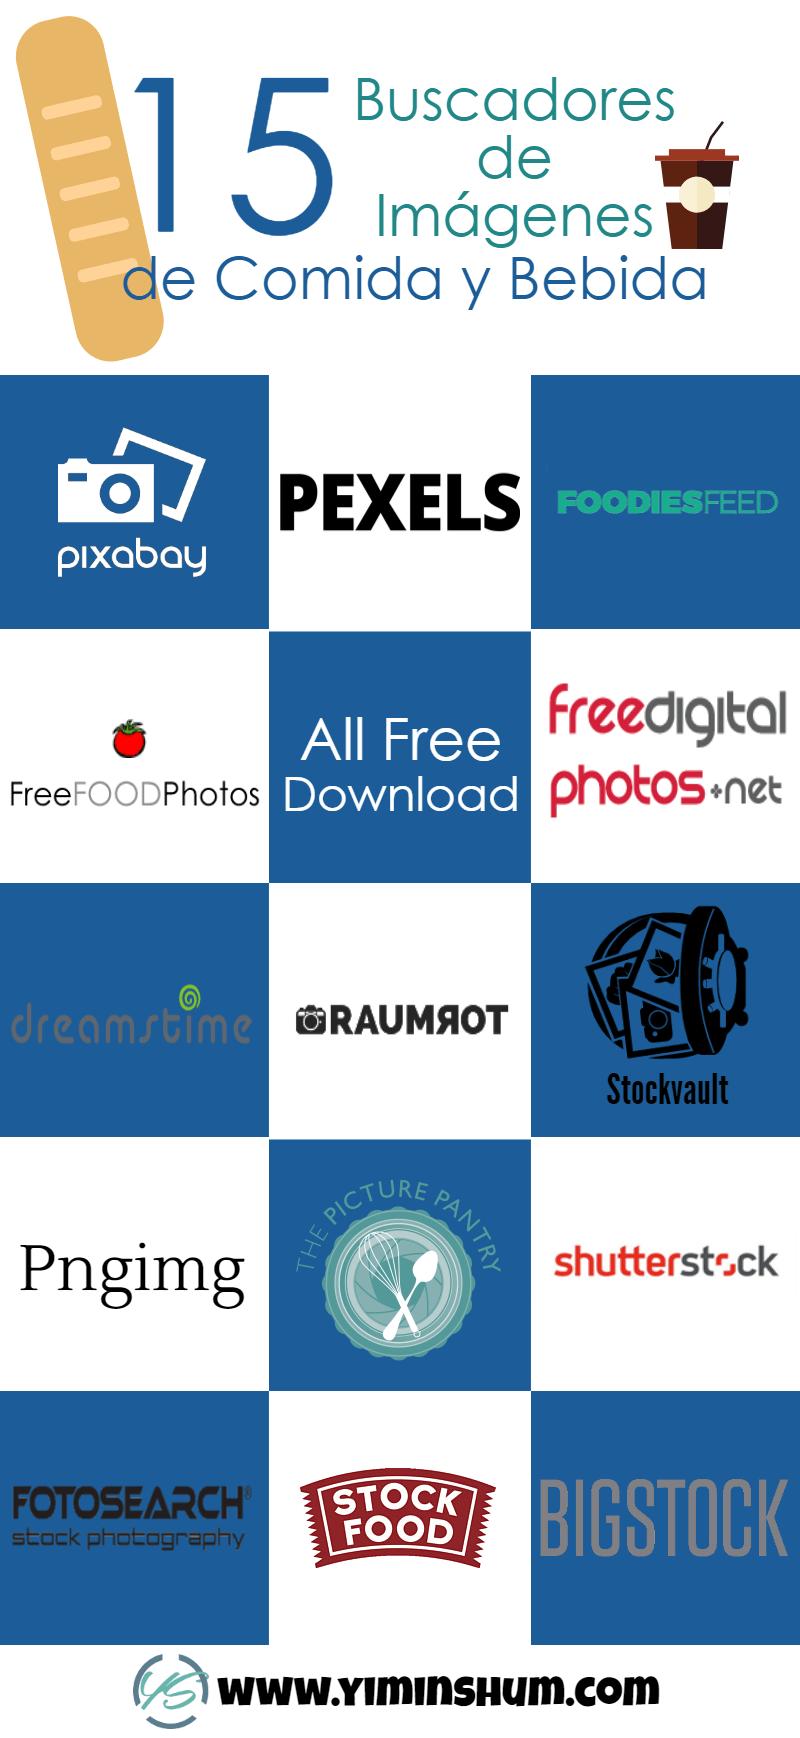 15-buscadores-de-comida-infografia